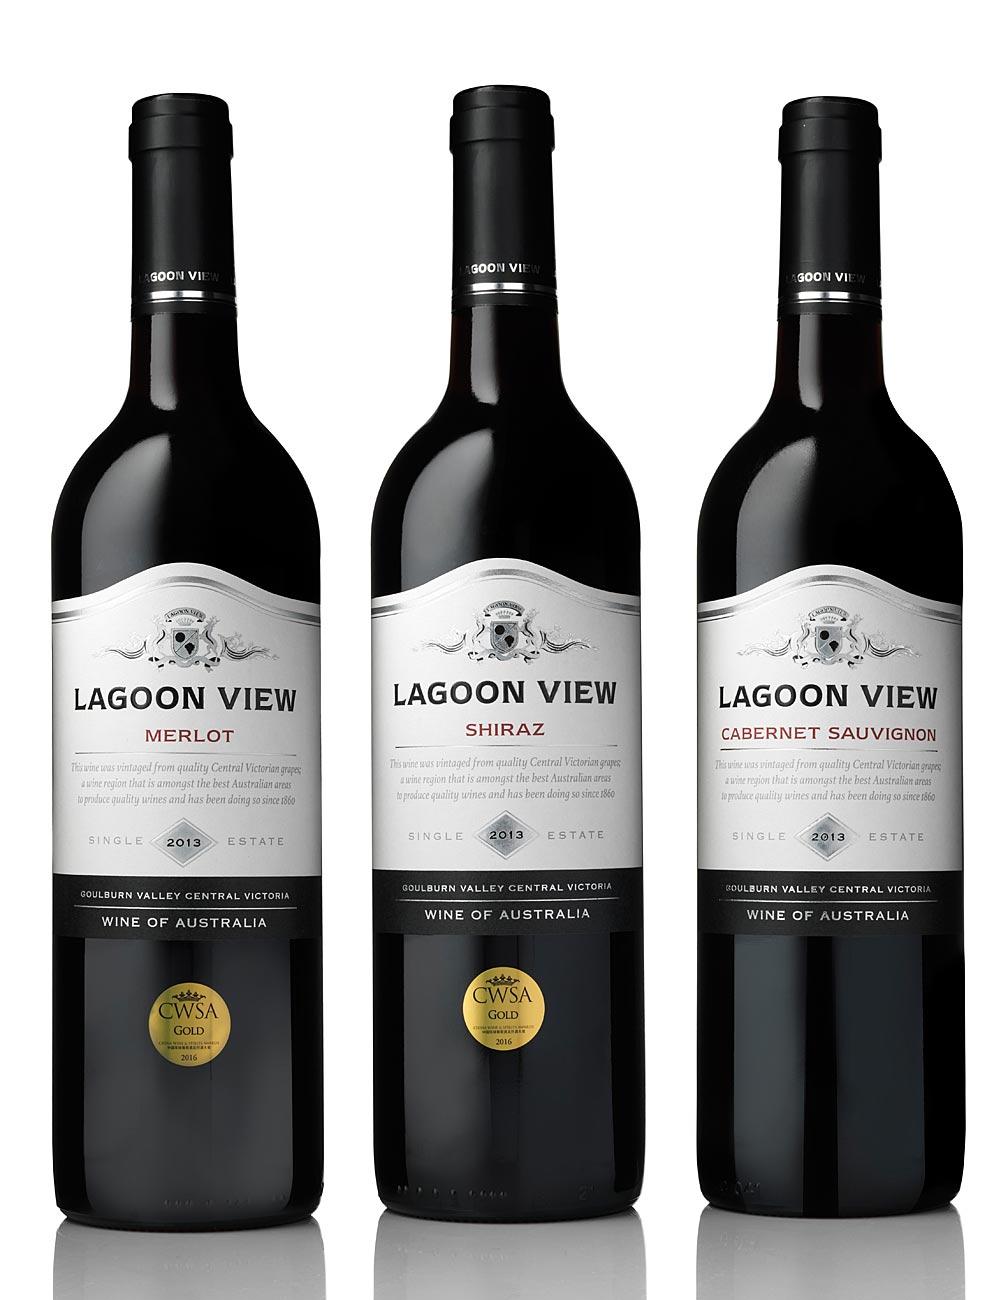 lagoon-view-wine-bottle-photography.jpg